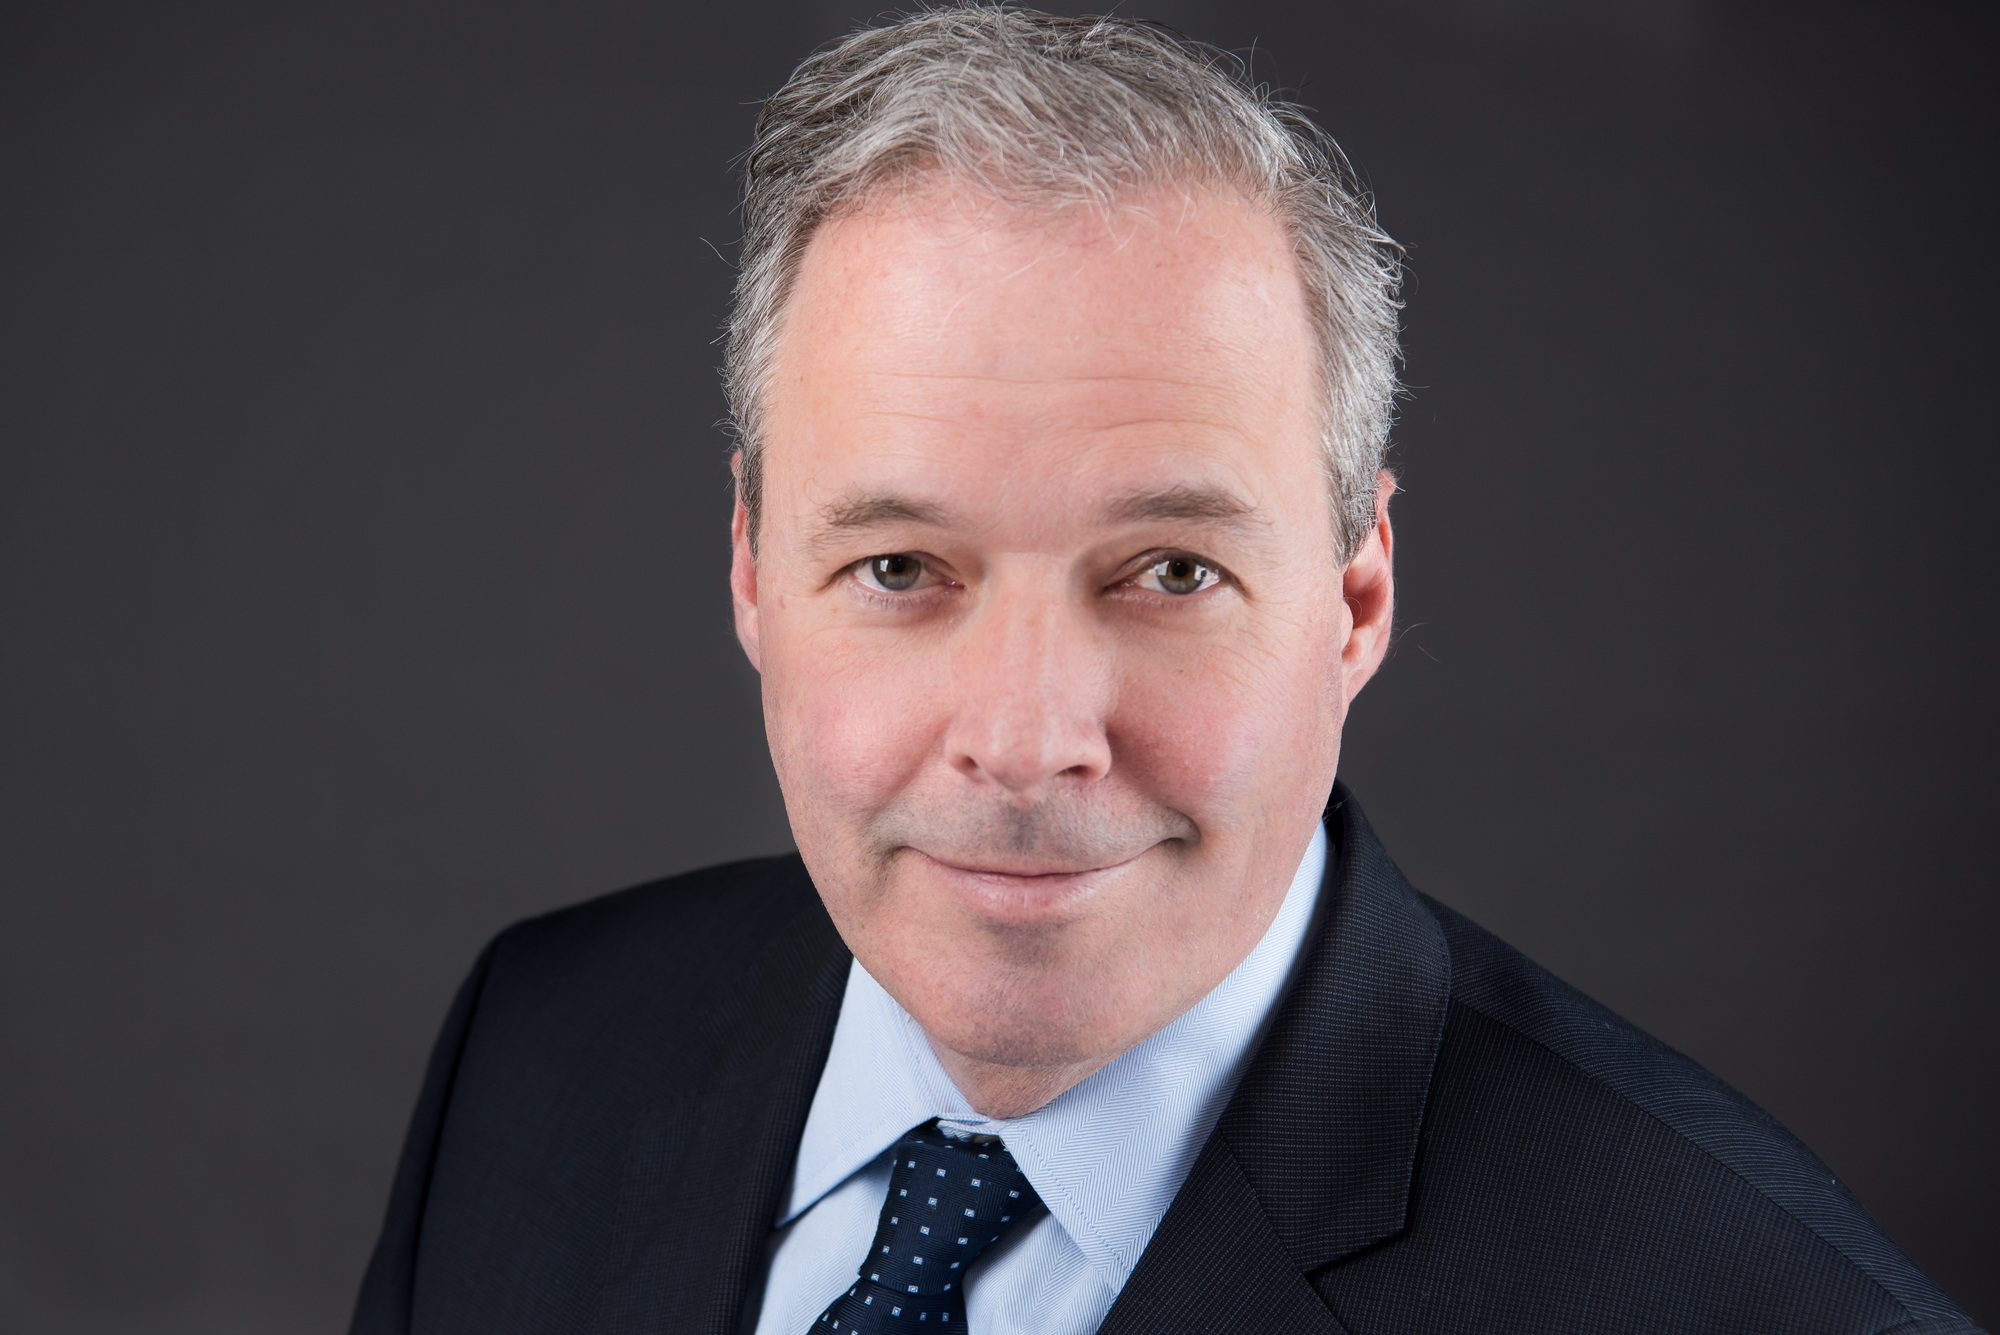 Trevor Williams - TD Wealth Private Investment Advice - Ottawa, ON K1R 7X7 - (613)783-2018 | ShowMeLocal.com